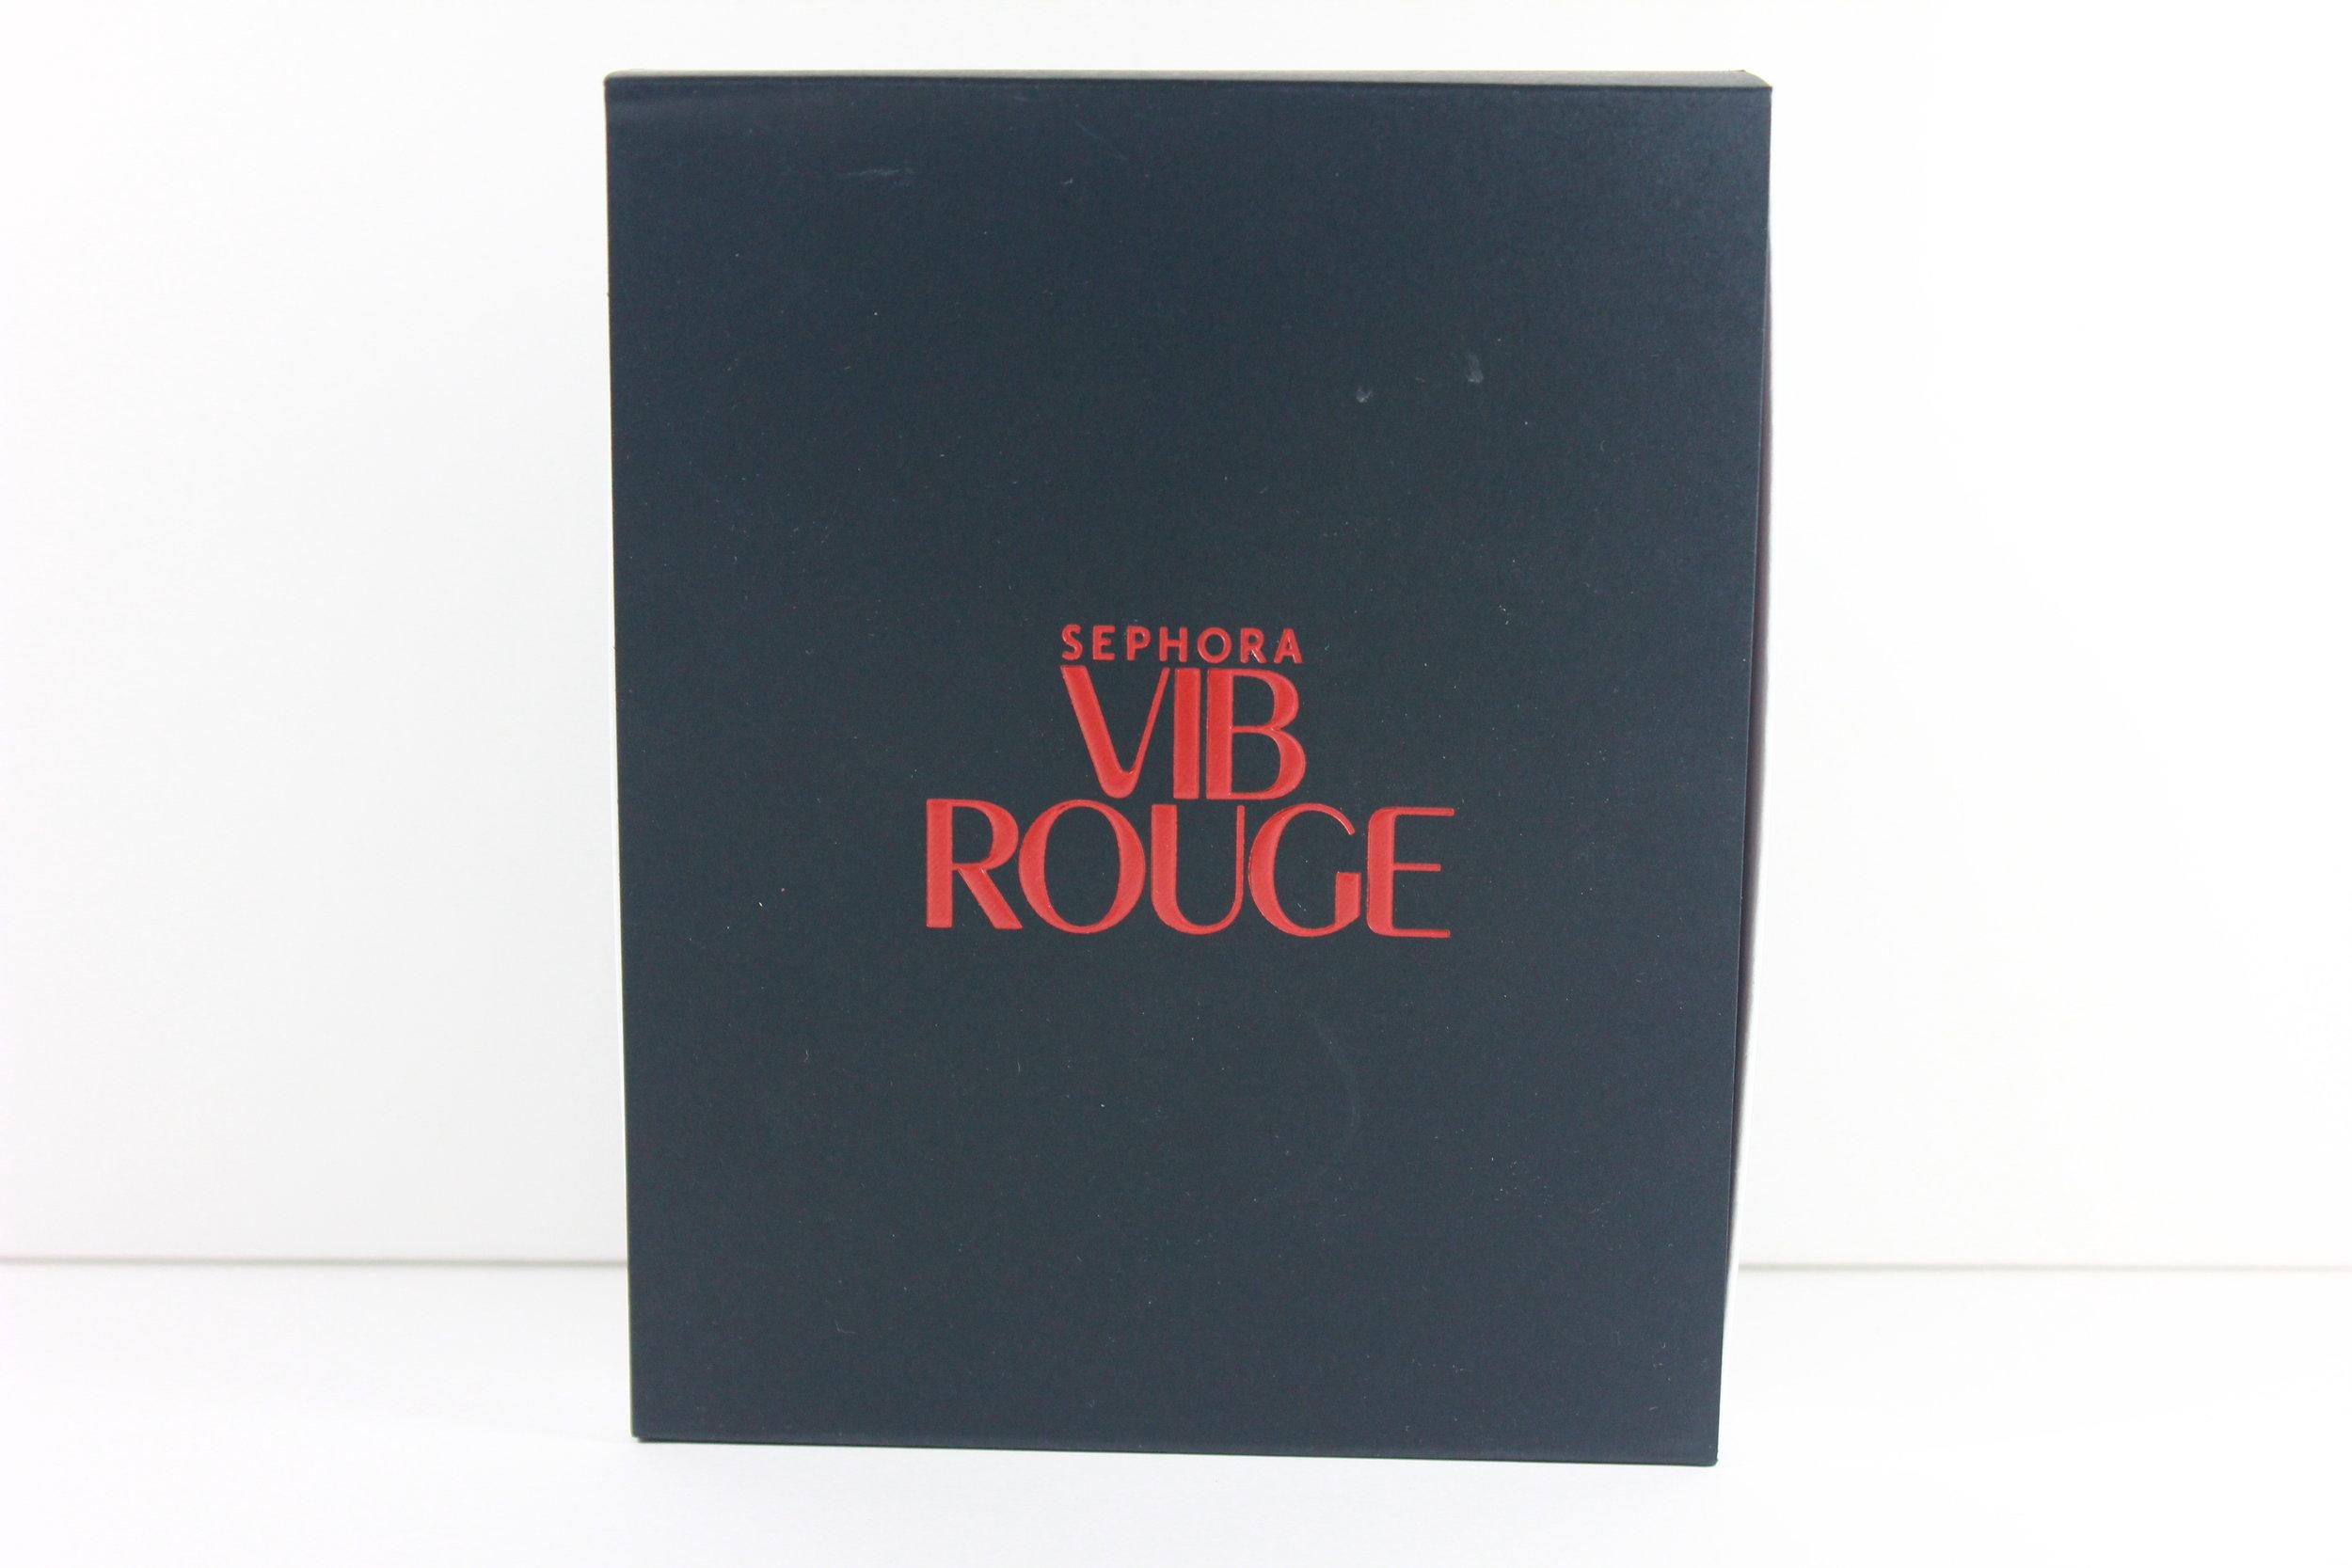 sephora vib rogue 1